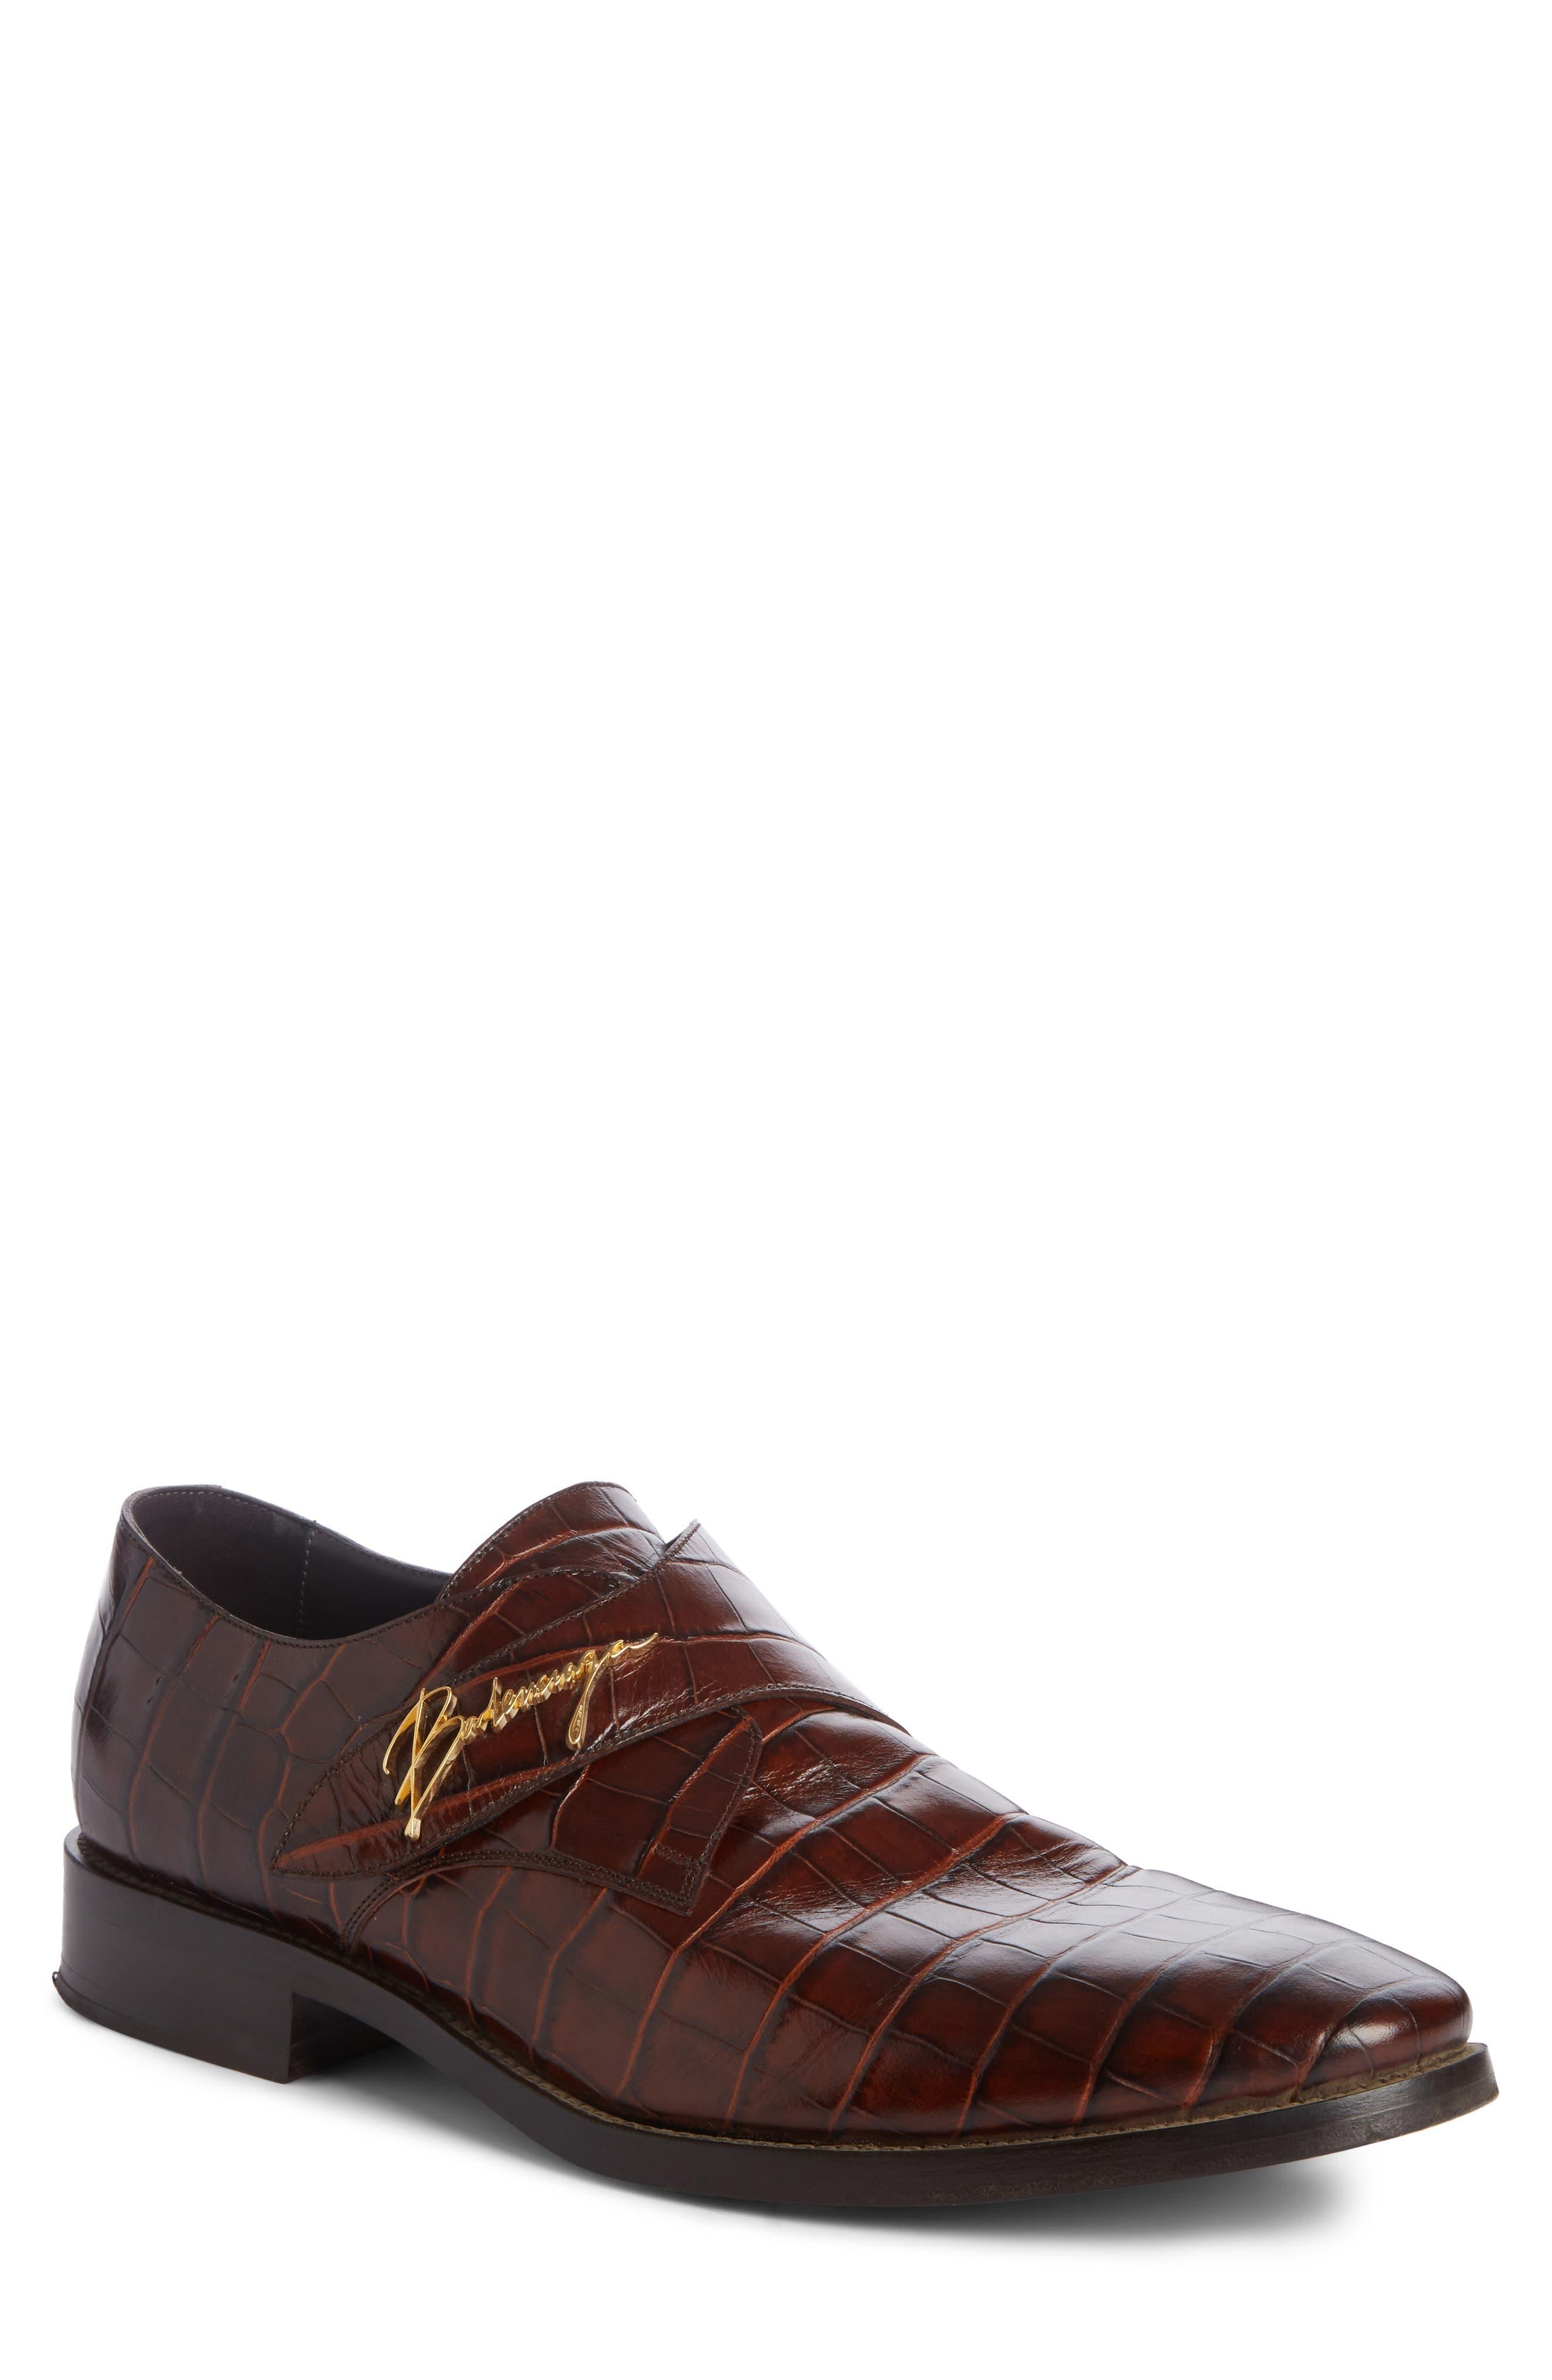 Monk Strap Shoe,                             Main thumbnail 1, color,                             Marron Chocolat